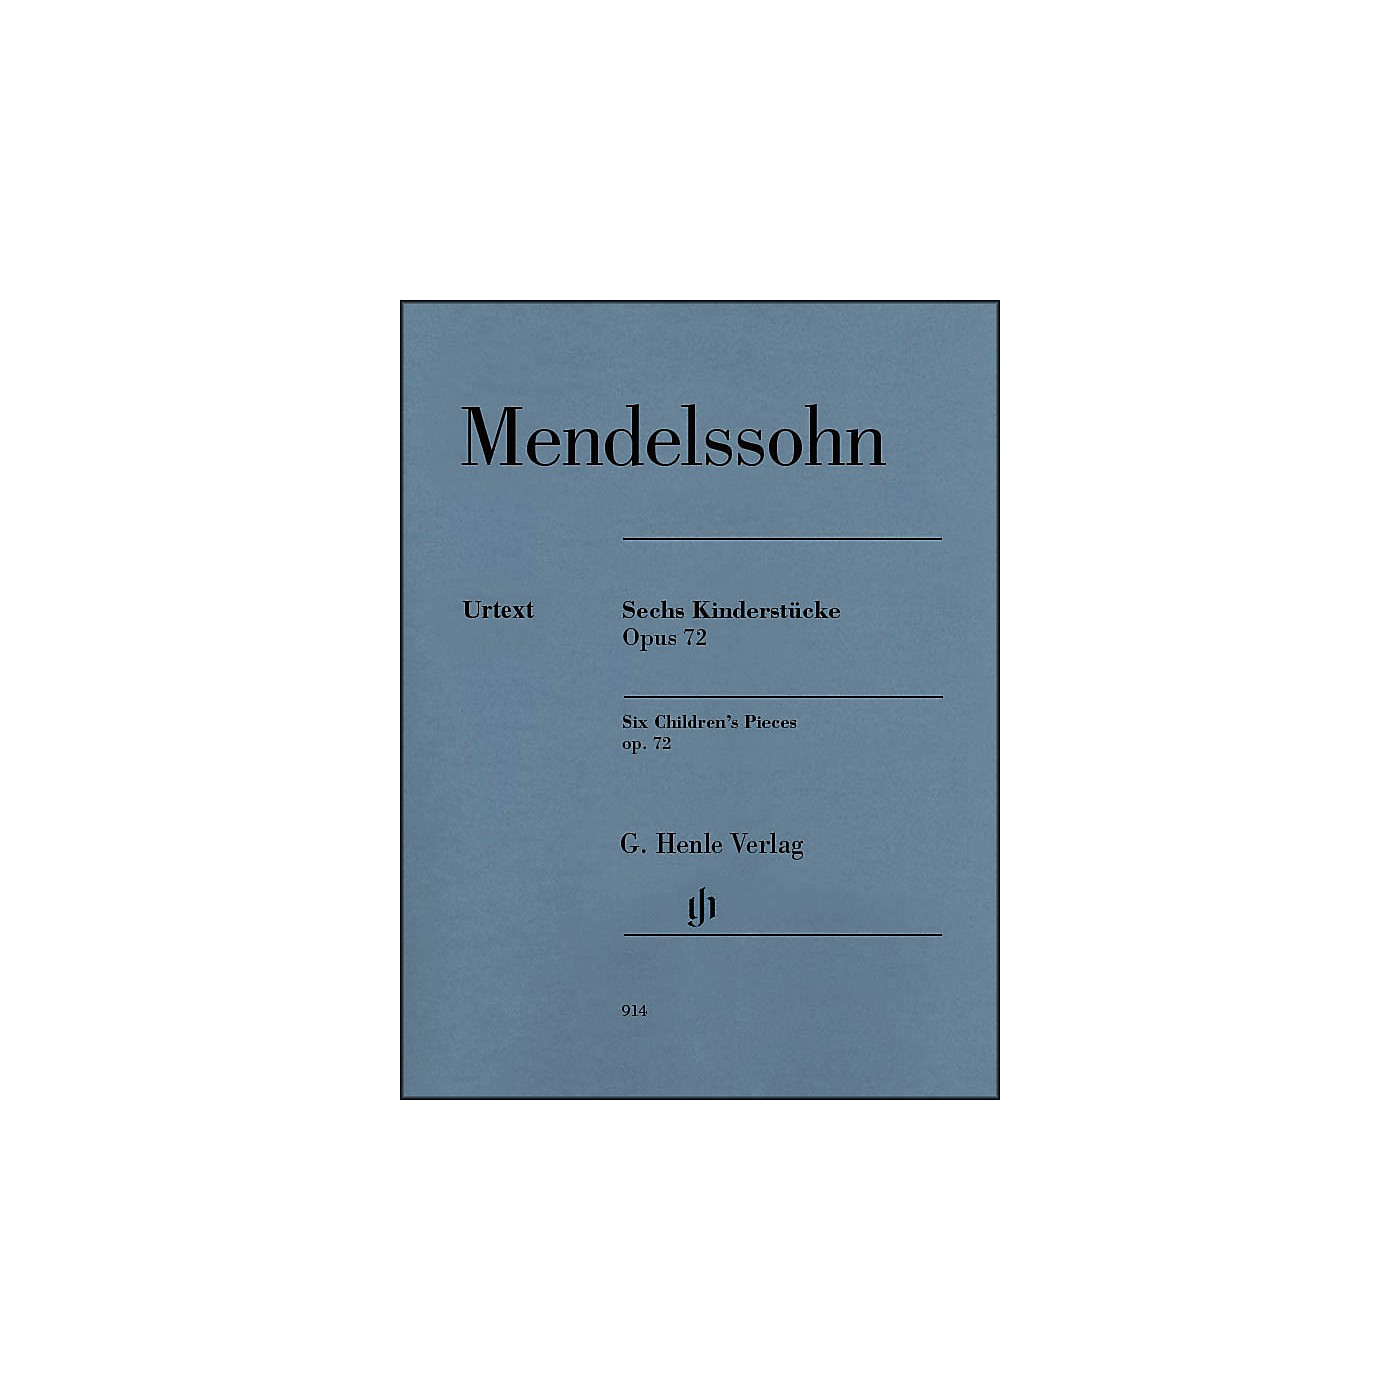 G. Henle Verlag 6 Children's Pieces Op. 72 for Piano Solo By Mendelssohn thumbnail